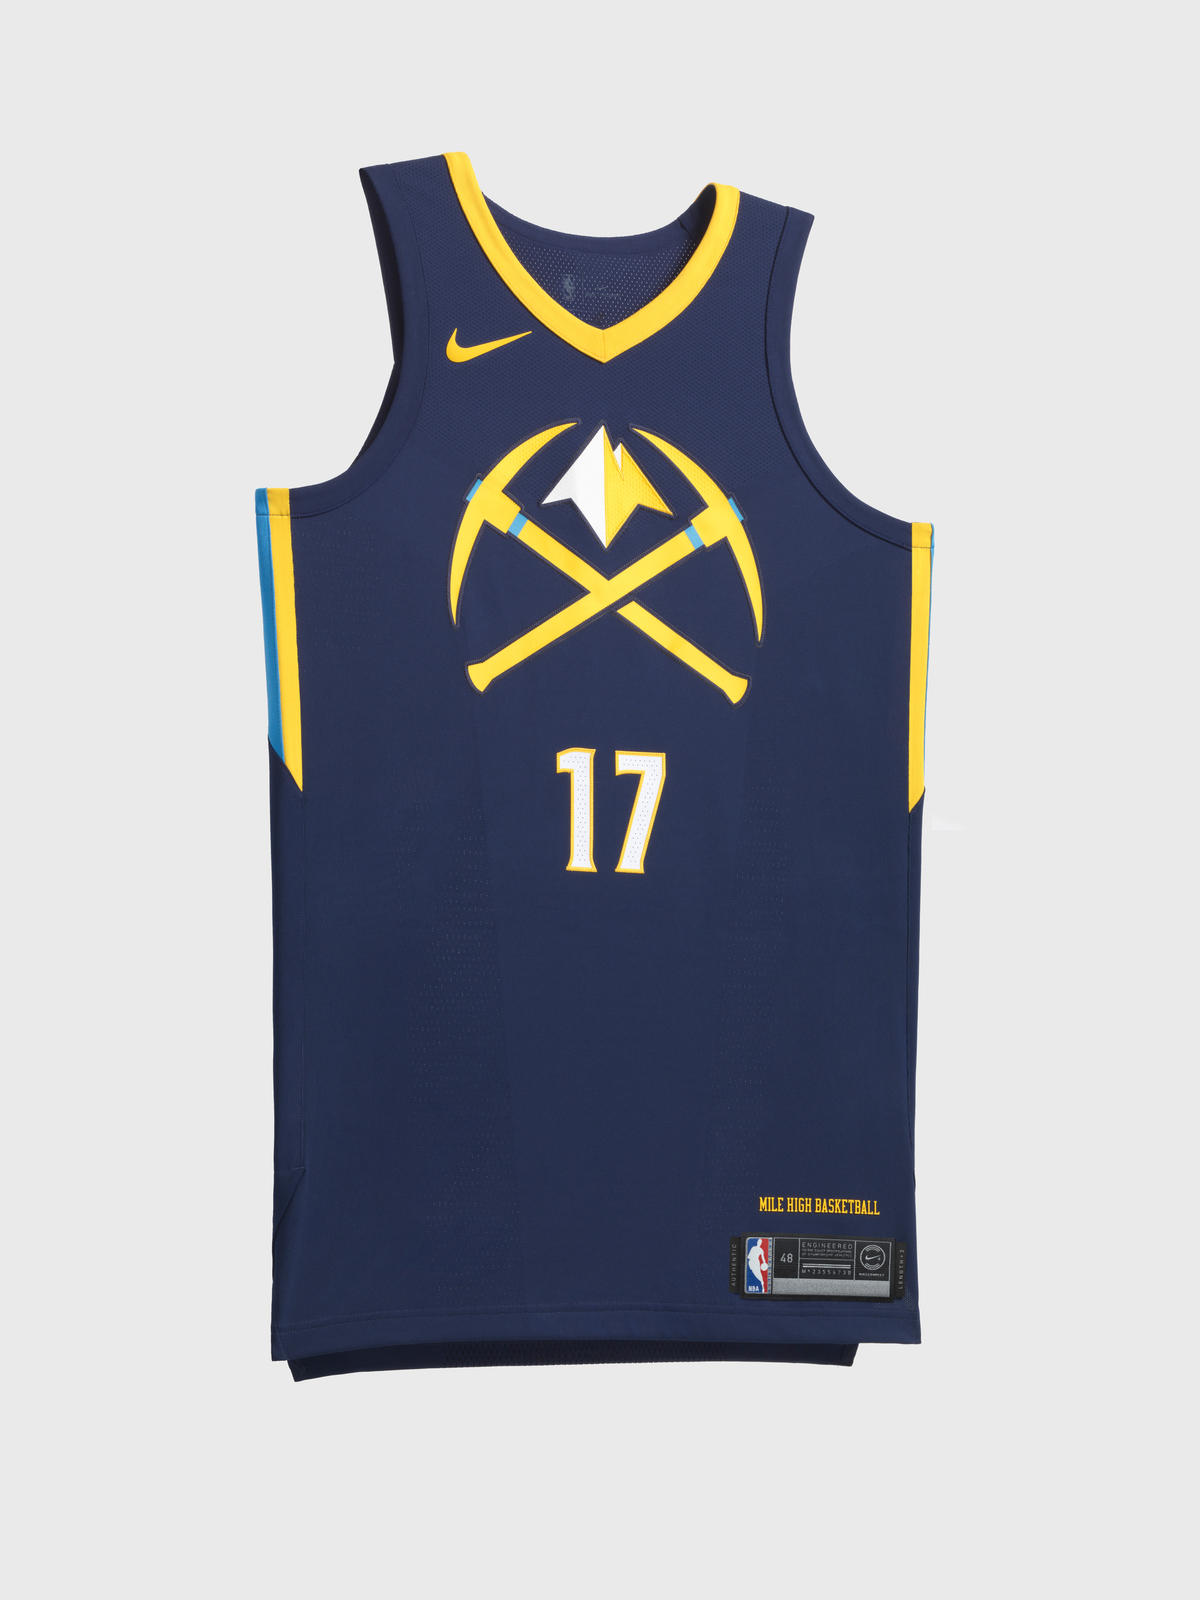 Nike_NBA_City_Edition_Uniform_Denver_Nuggets_0126_native_1600